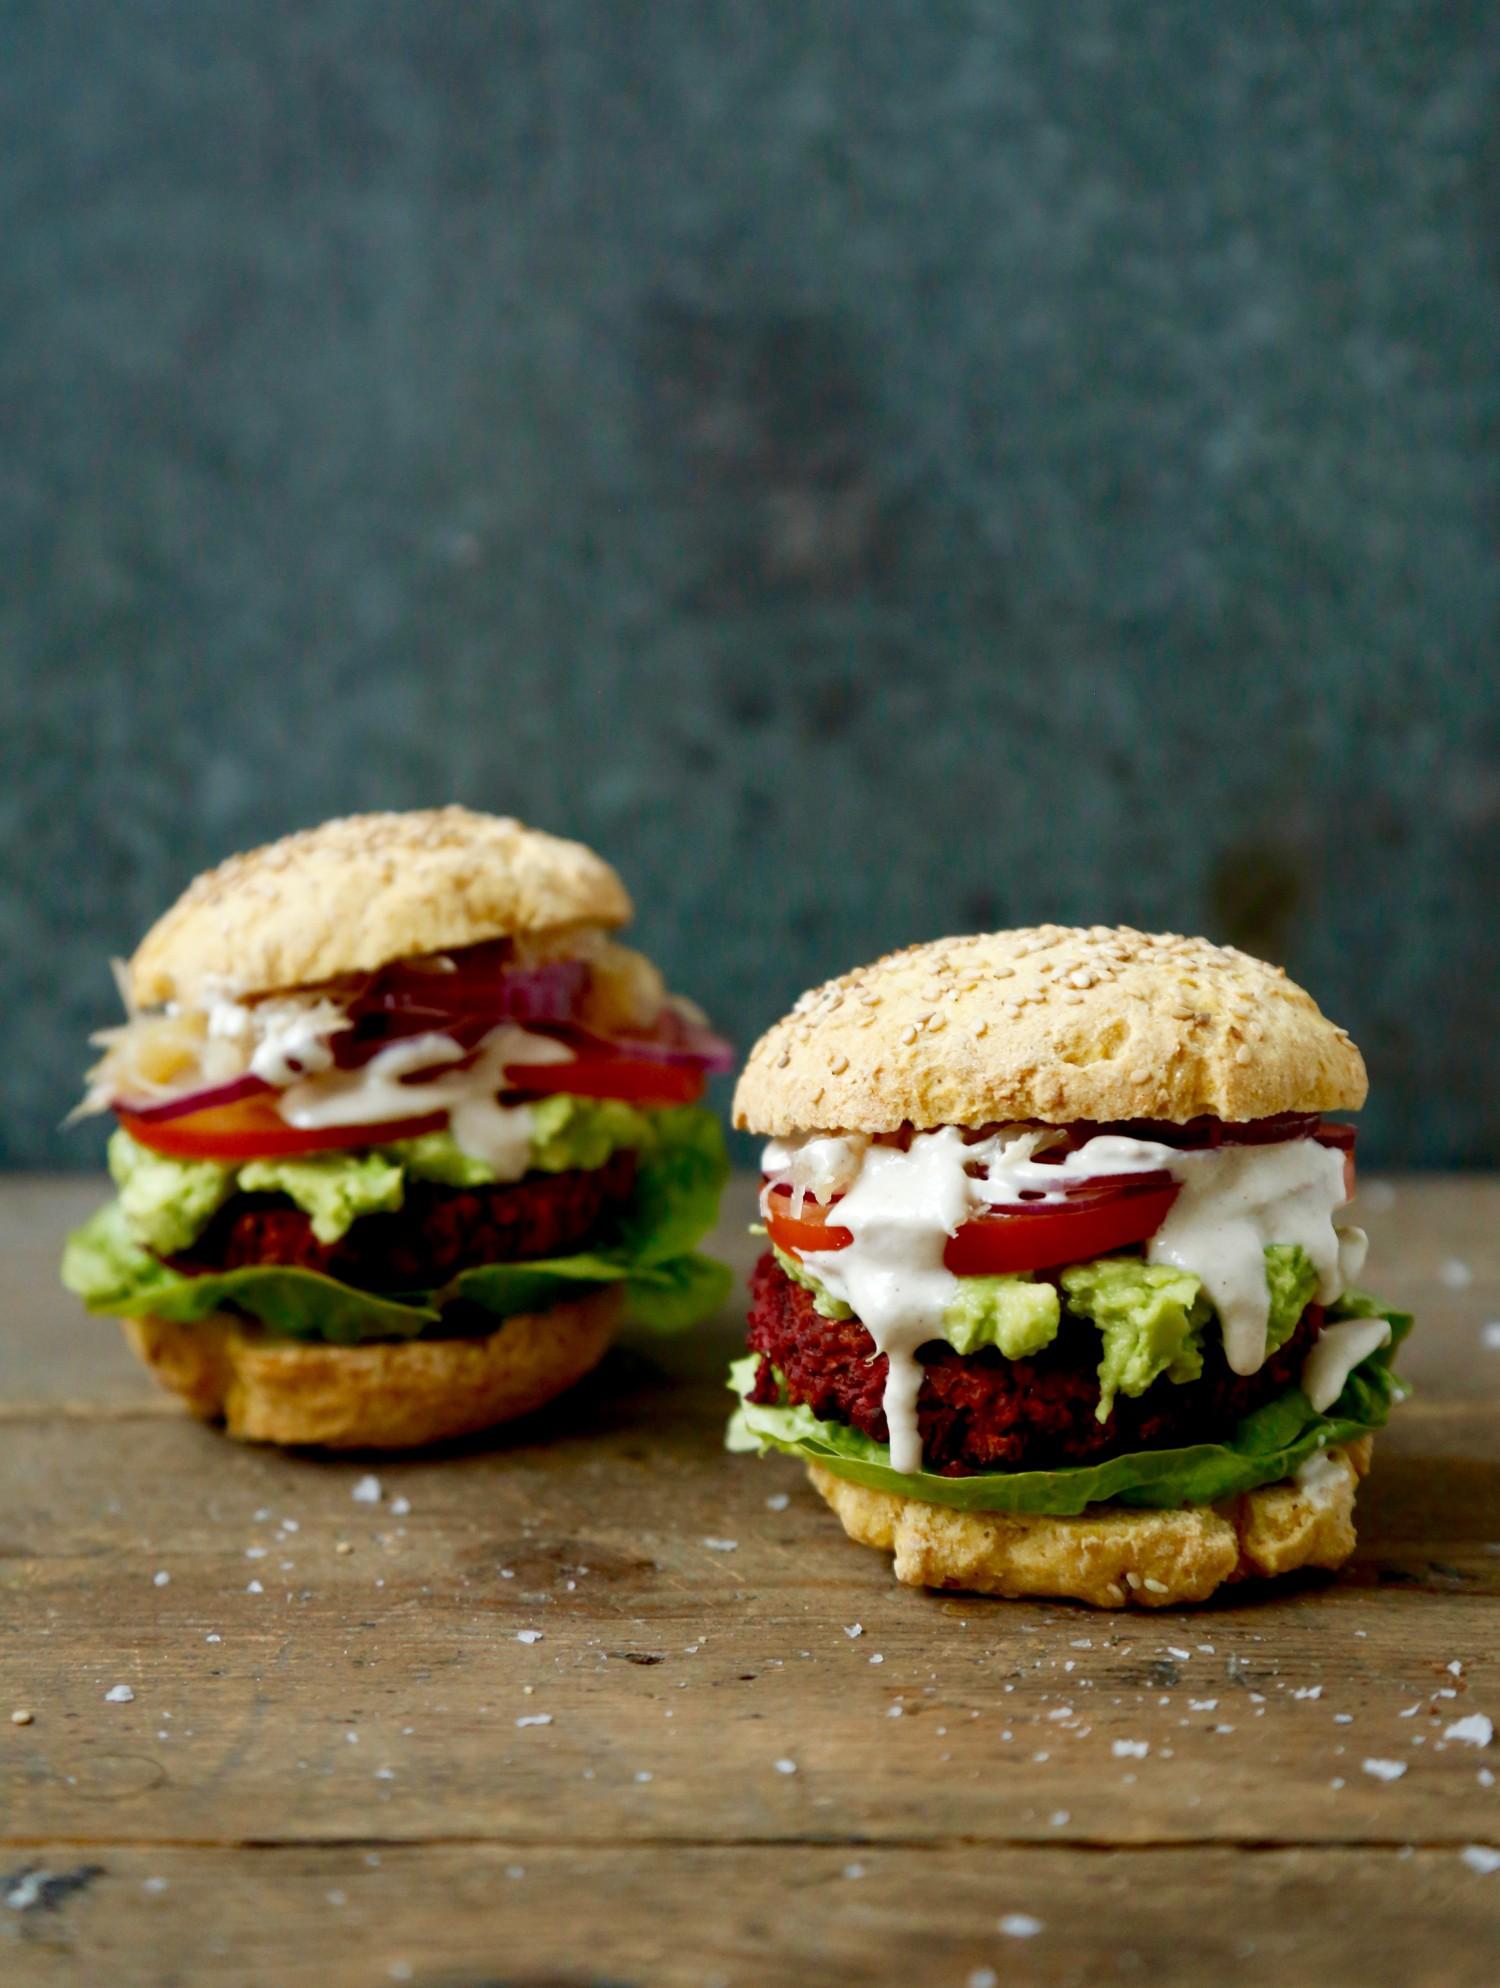 simple-glutenfri-burgerboller-vegansk-opskrift-1-1